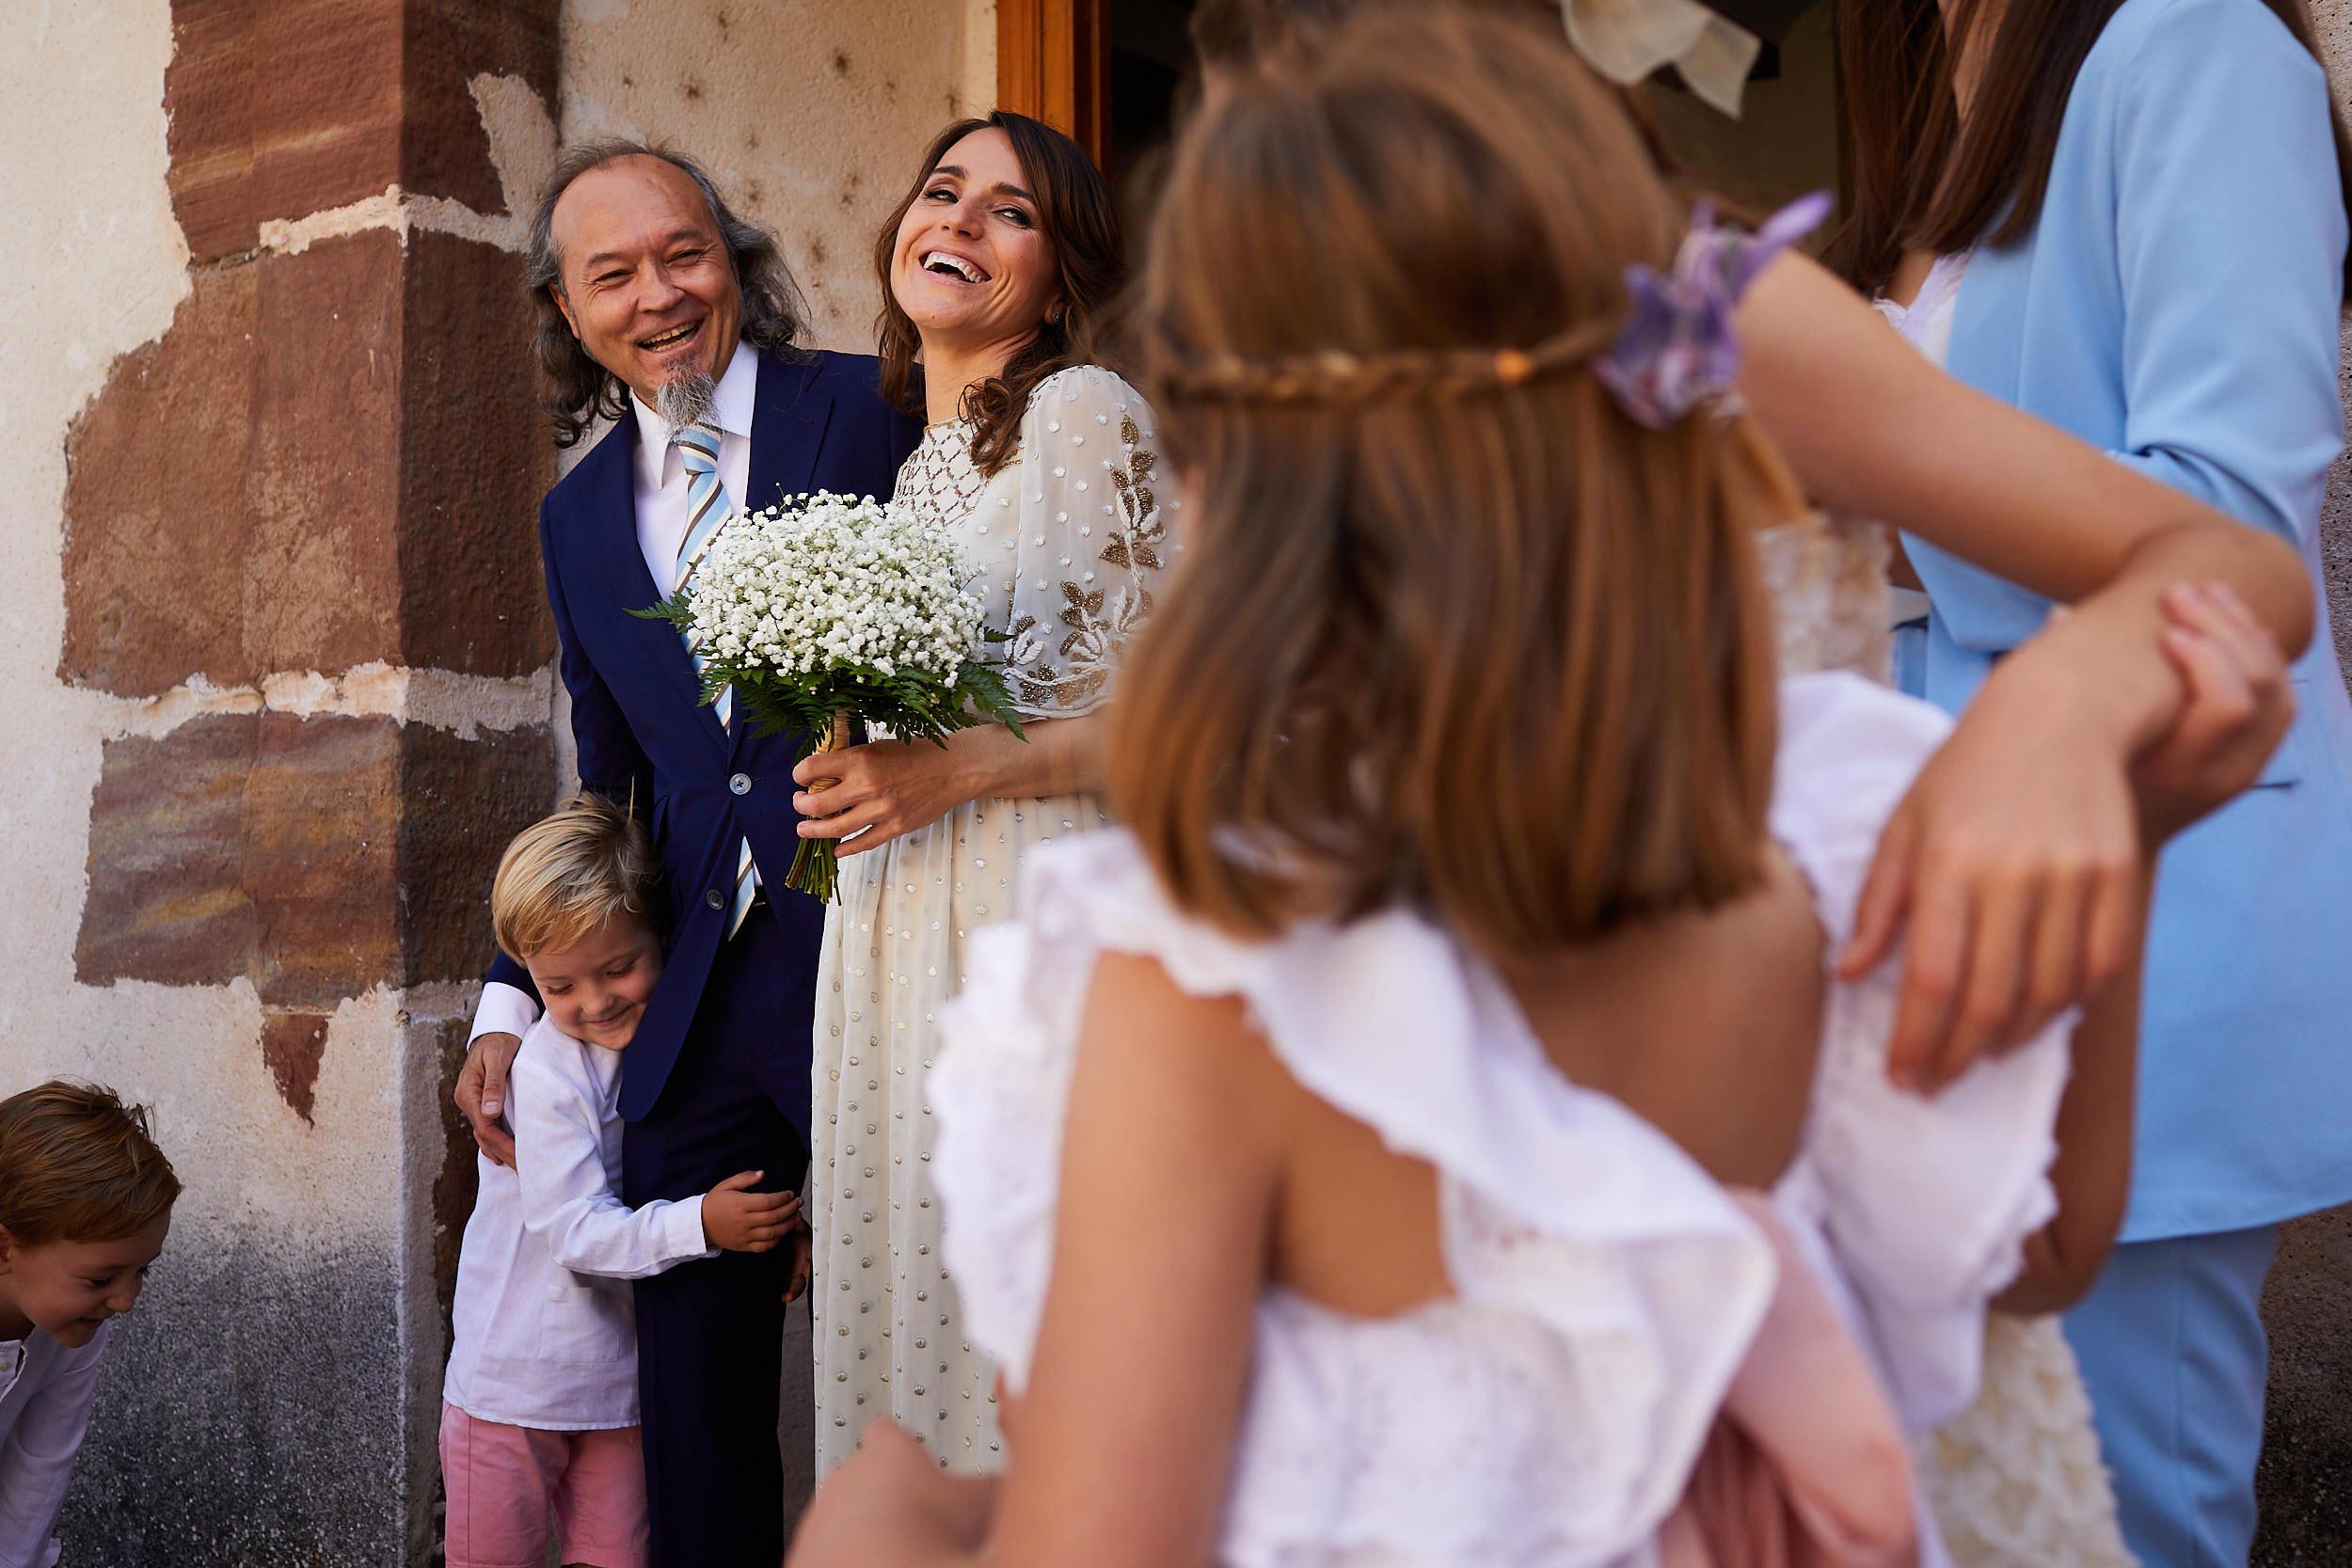 Wedding_Rioja_Basque_Country_Spain_James_Sturcke17.jpg